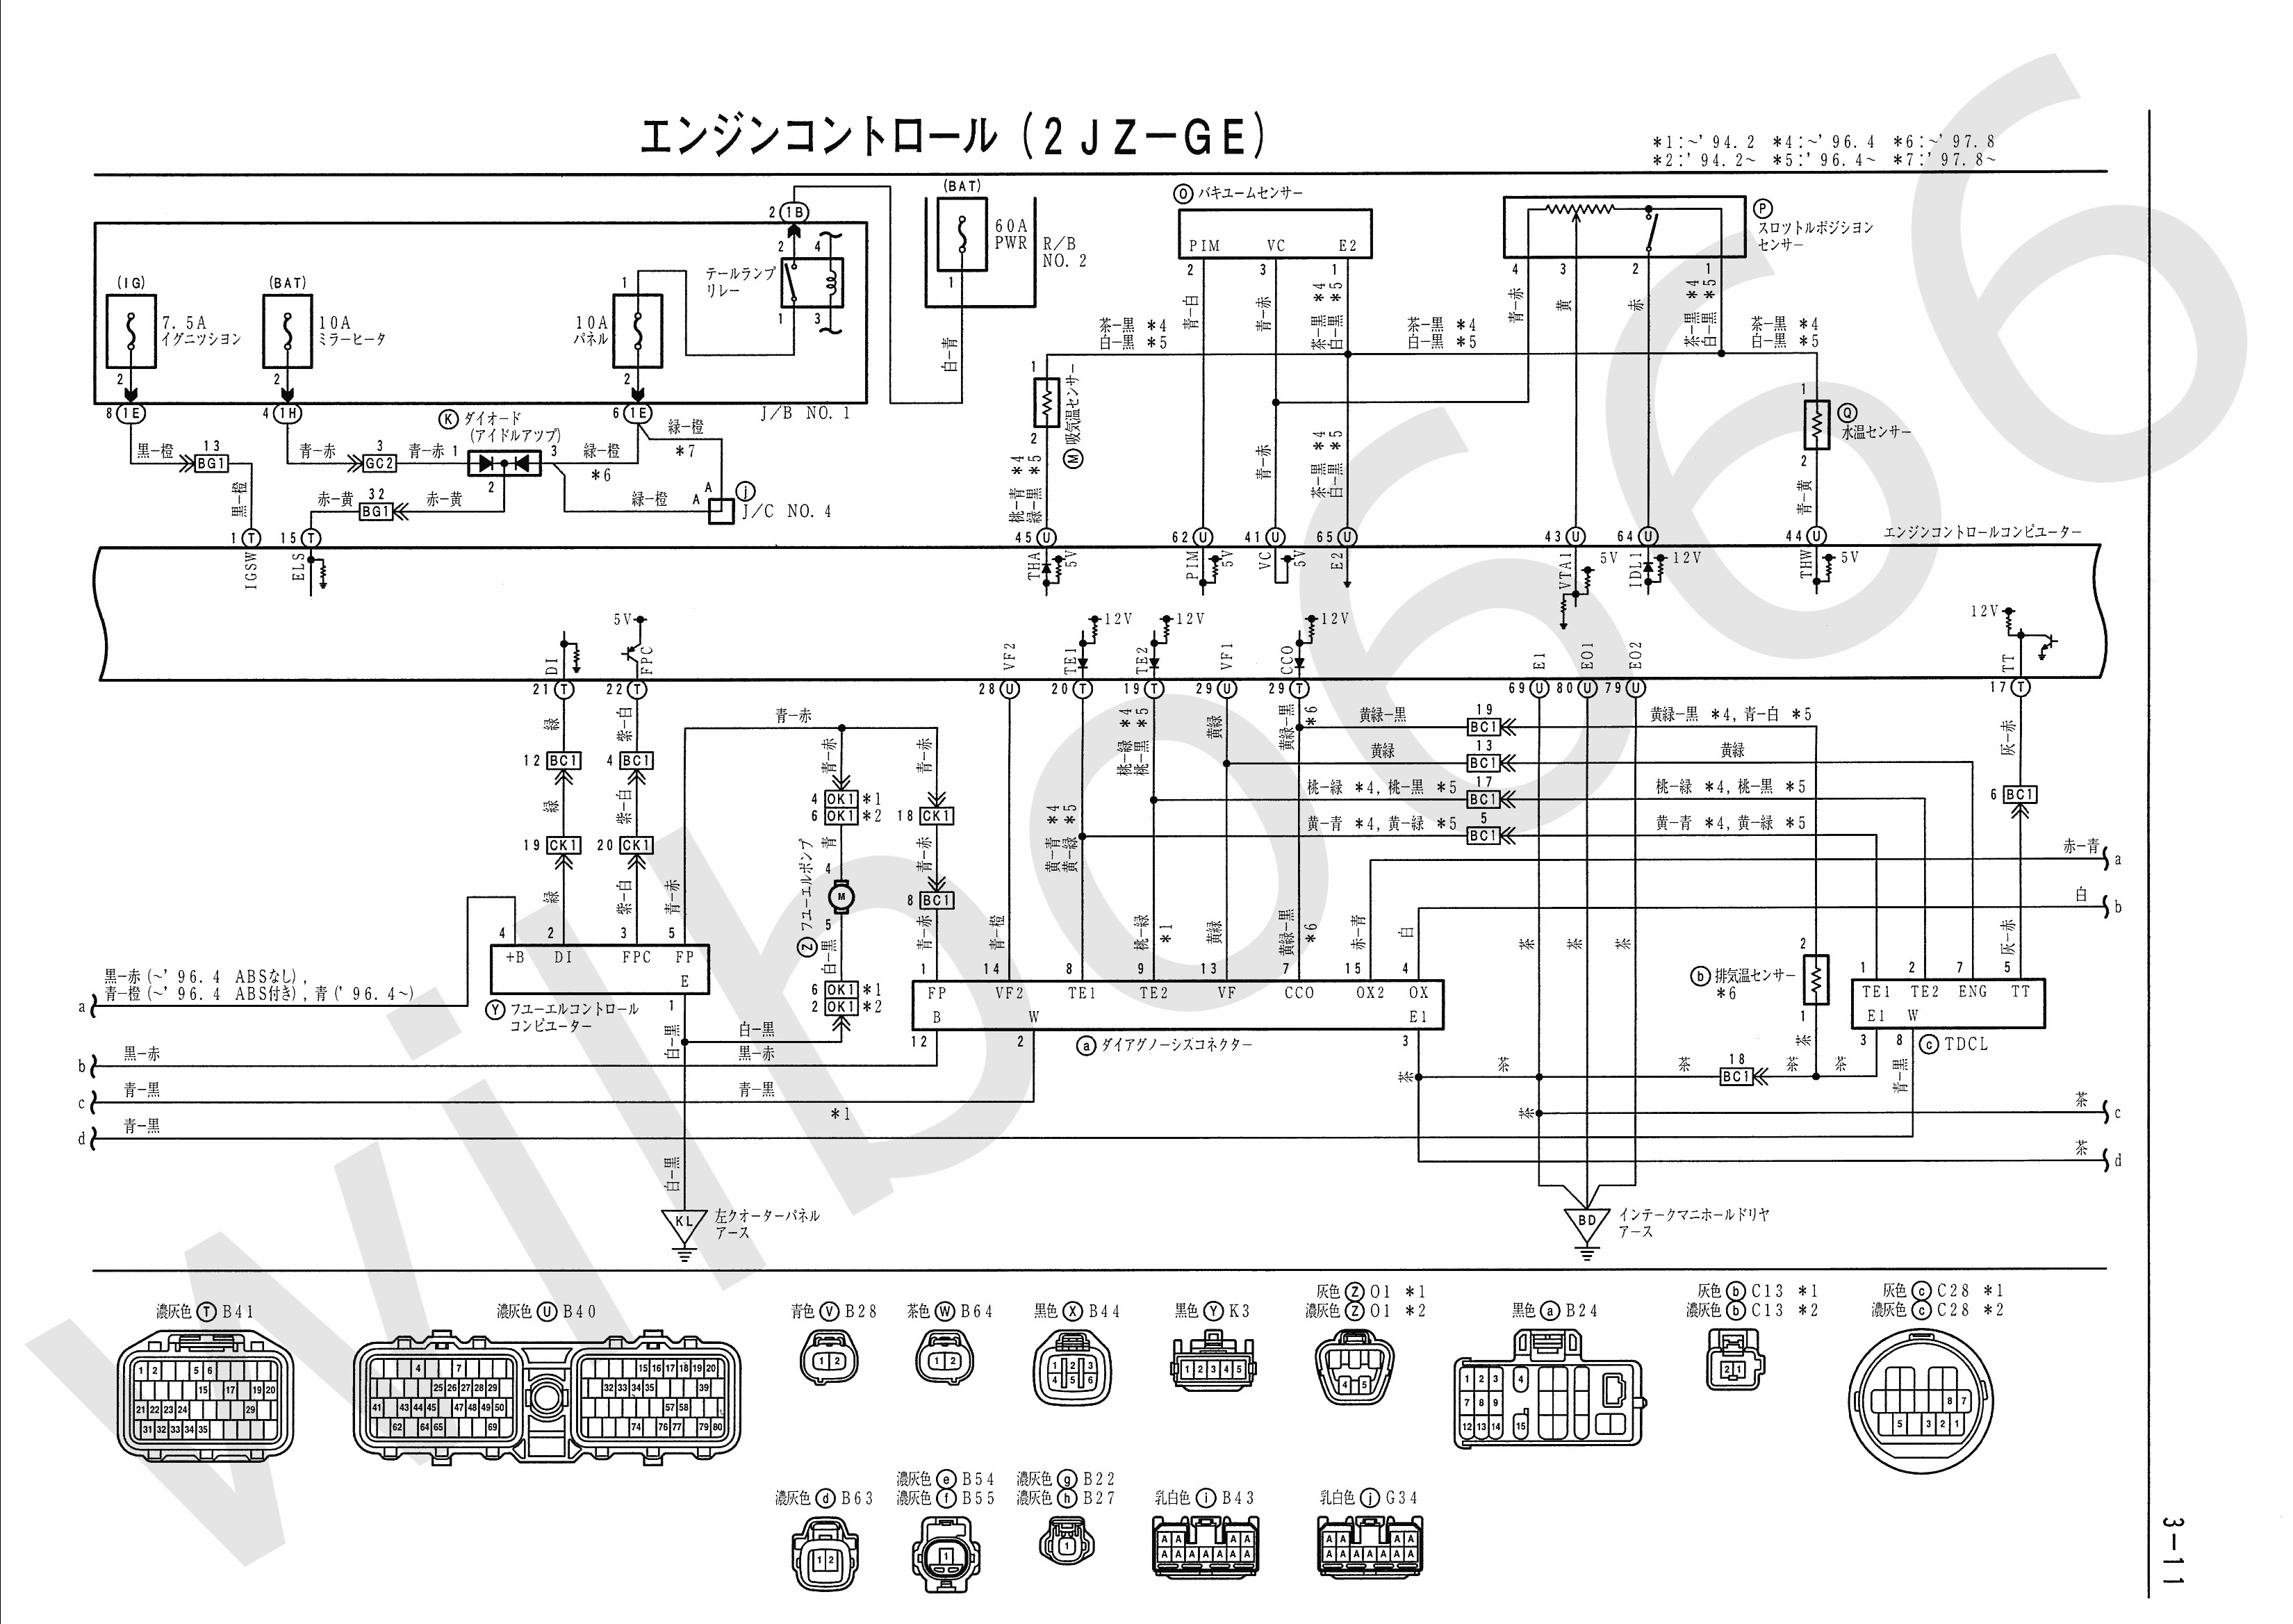 Engine Coolant Temperature Sensor Wiring Diagram 1jz Series Ecu Harness And Wilbo666 2jz Ge Jza80 Supra Of